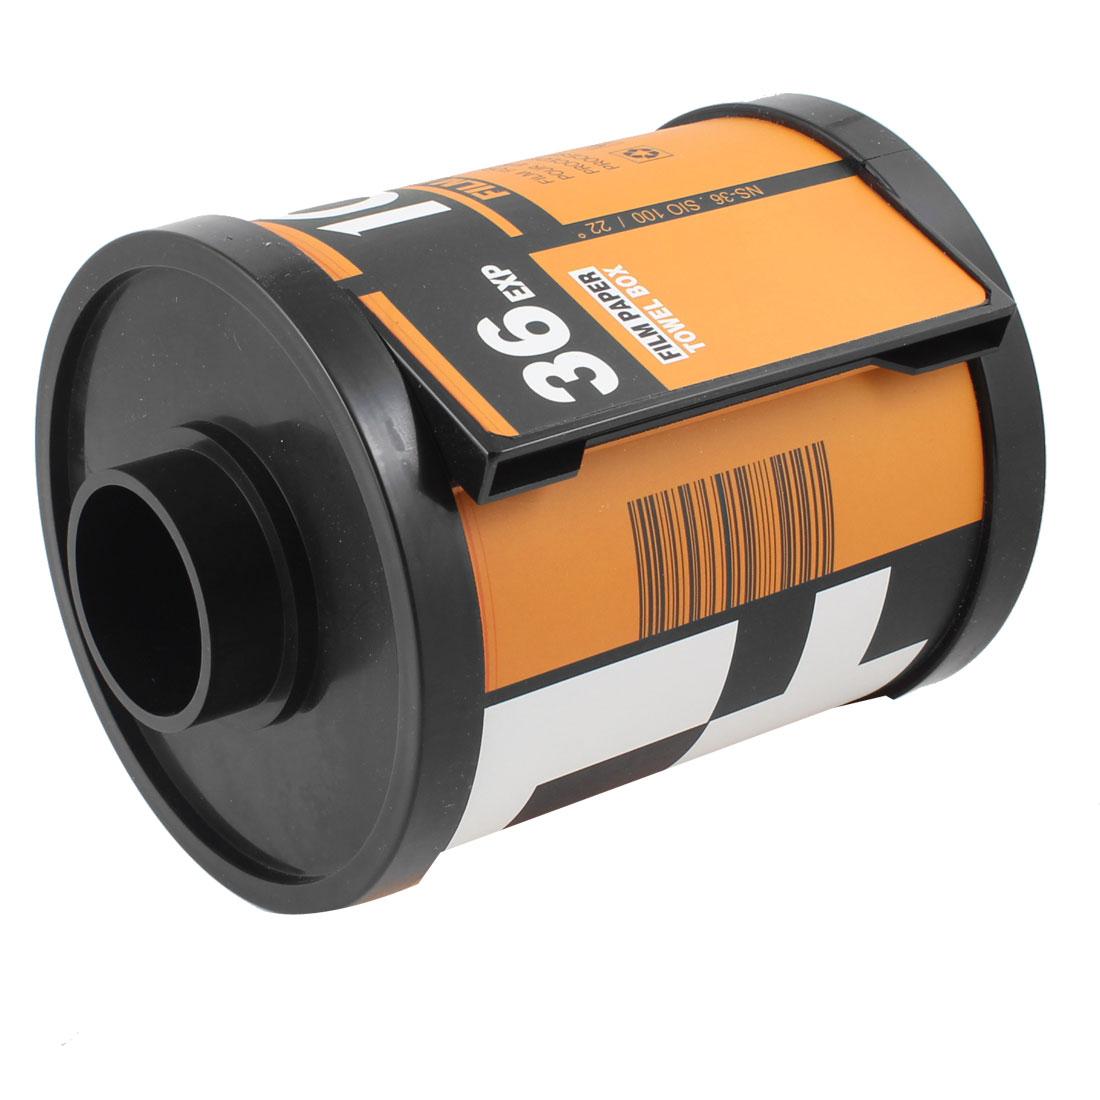 Film Canister Paper Towel Tissue Toilet Roll Holder Dispenser Storage Box Orange